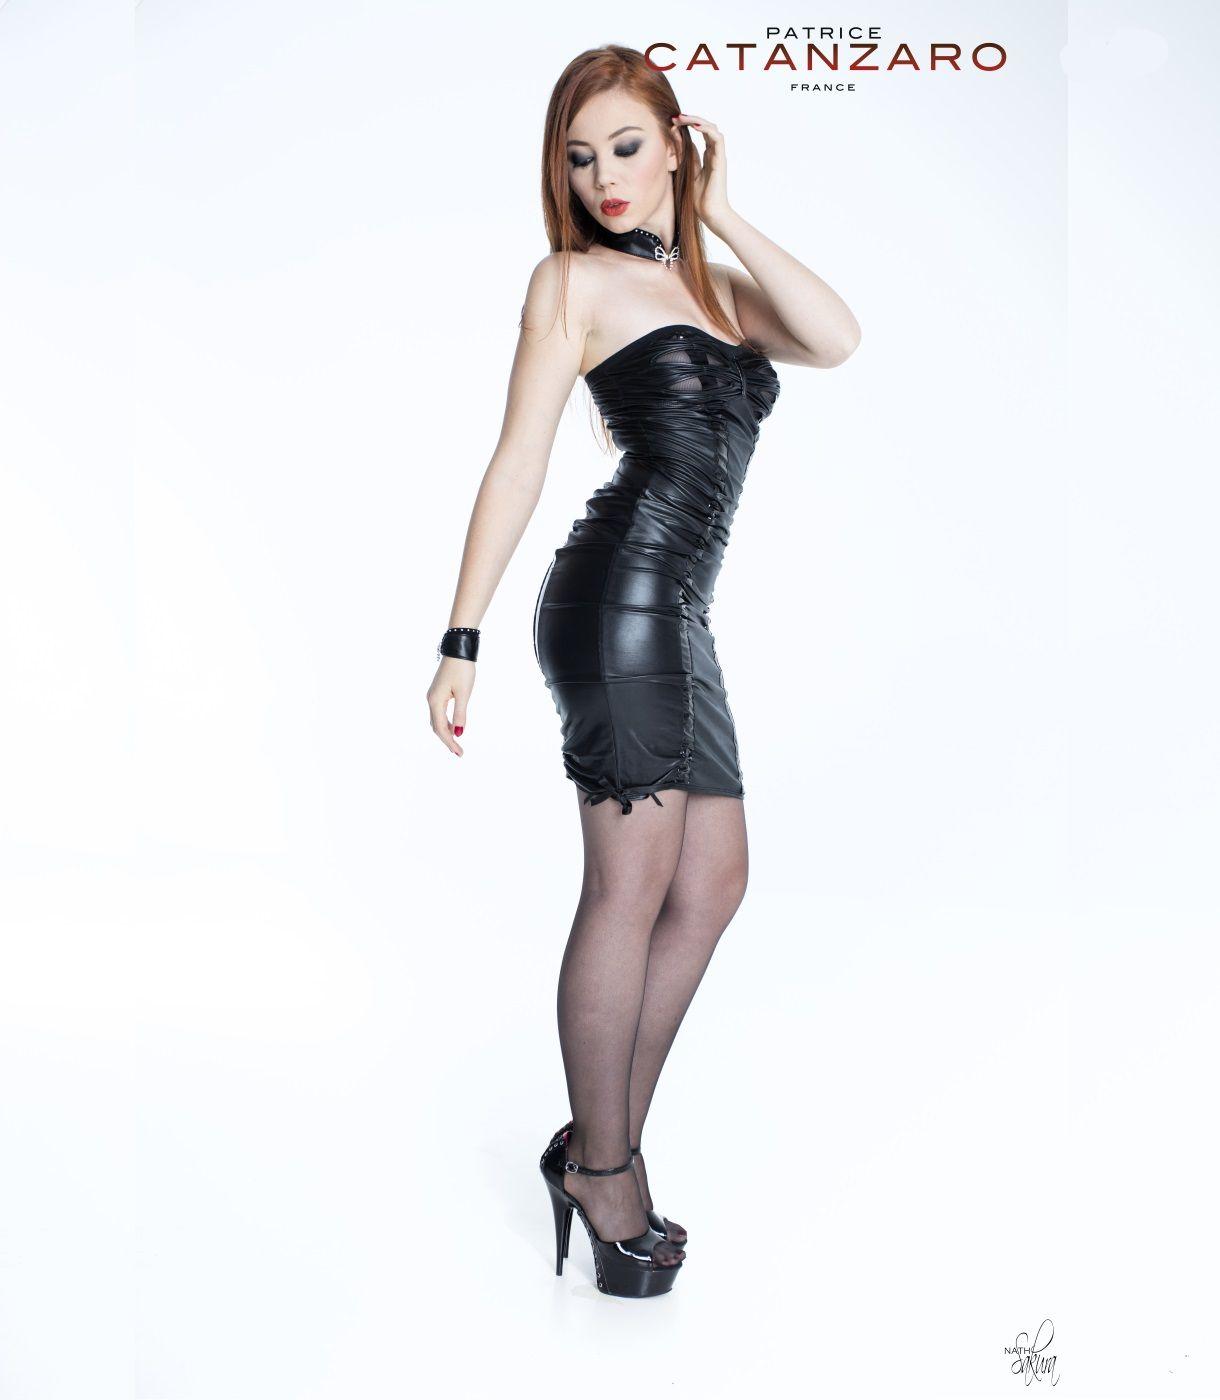 bd29b0f60ff3b5 Tamara Dress Wetlook by Patrice Catanzaro. Shop it at Xenses-shop.com.  Worldwide Express Delivery - TAX-Free 21%